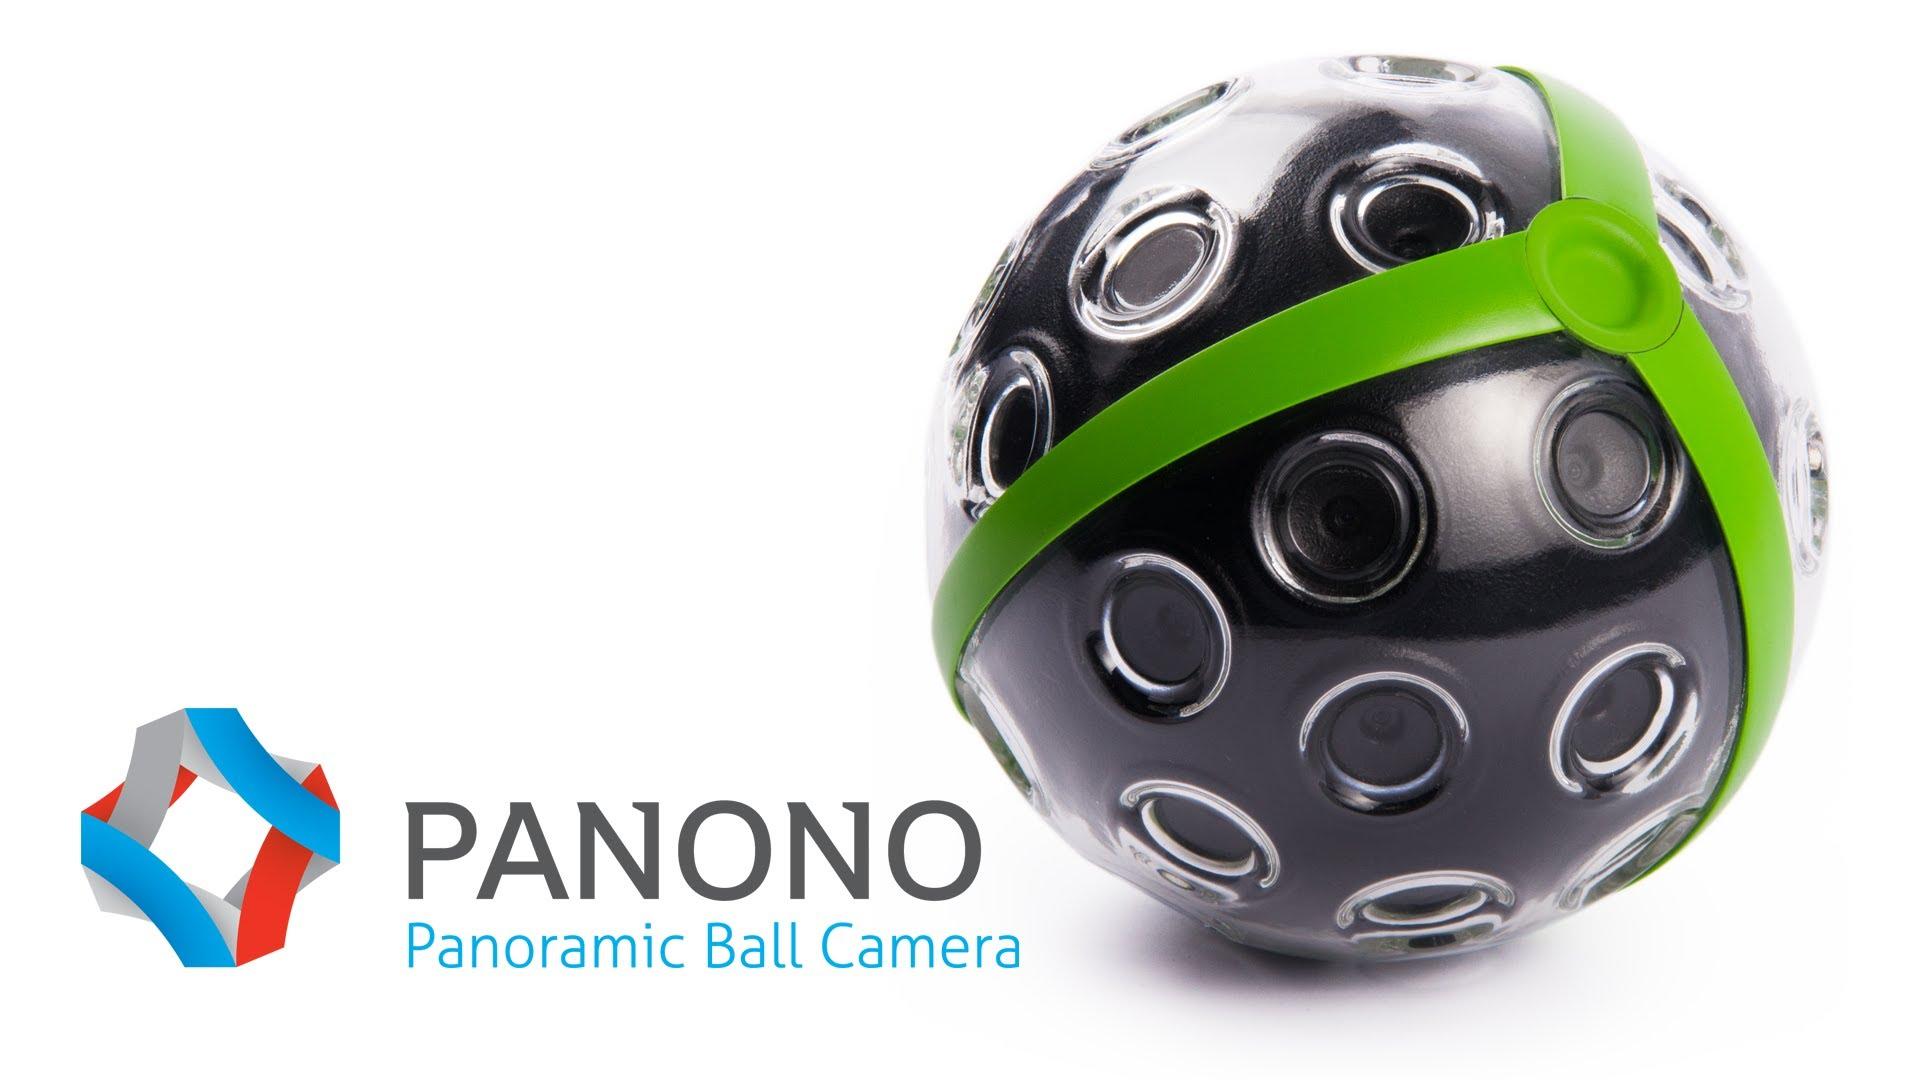 Panono throwable panoramic ball camera